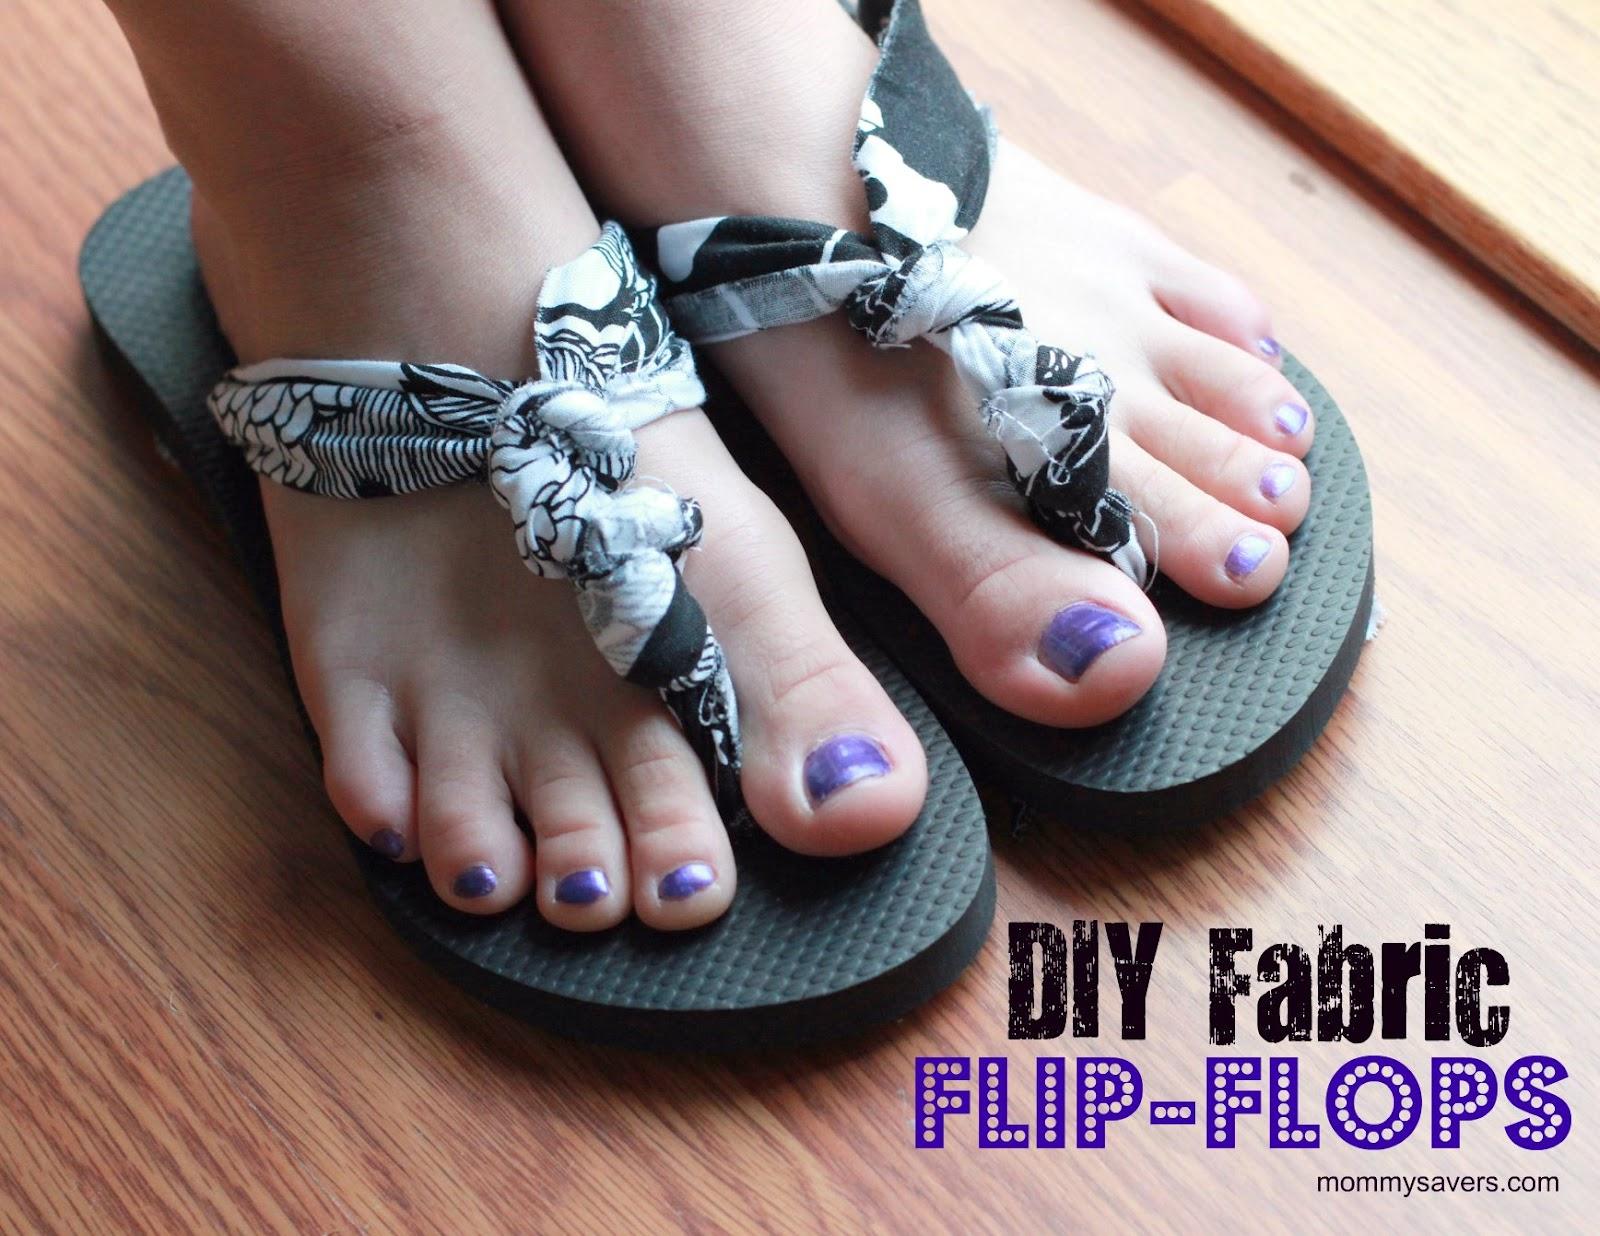 99362ba63fd34 A diary of pins flip flop makeover jpg 1600x1236 Flip flop makeovers